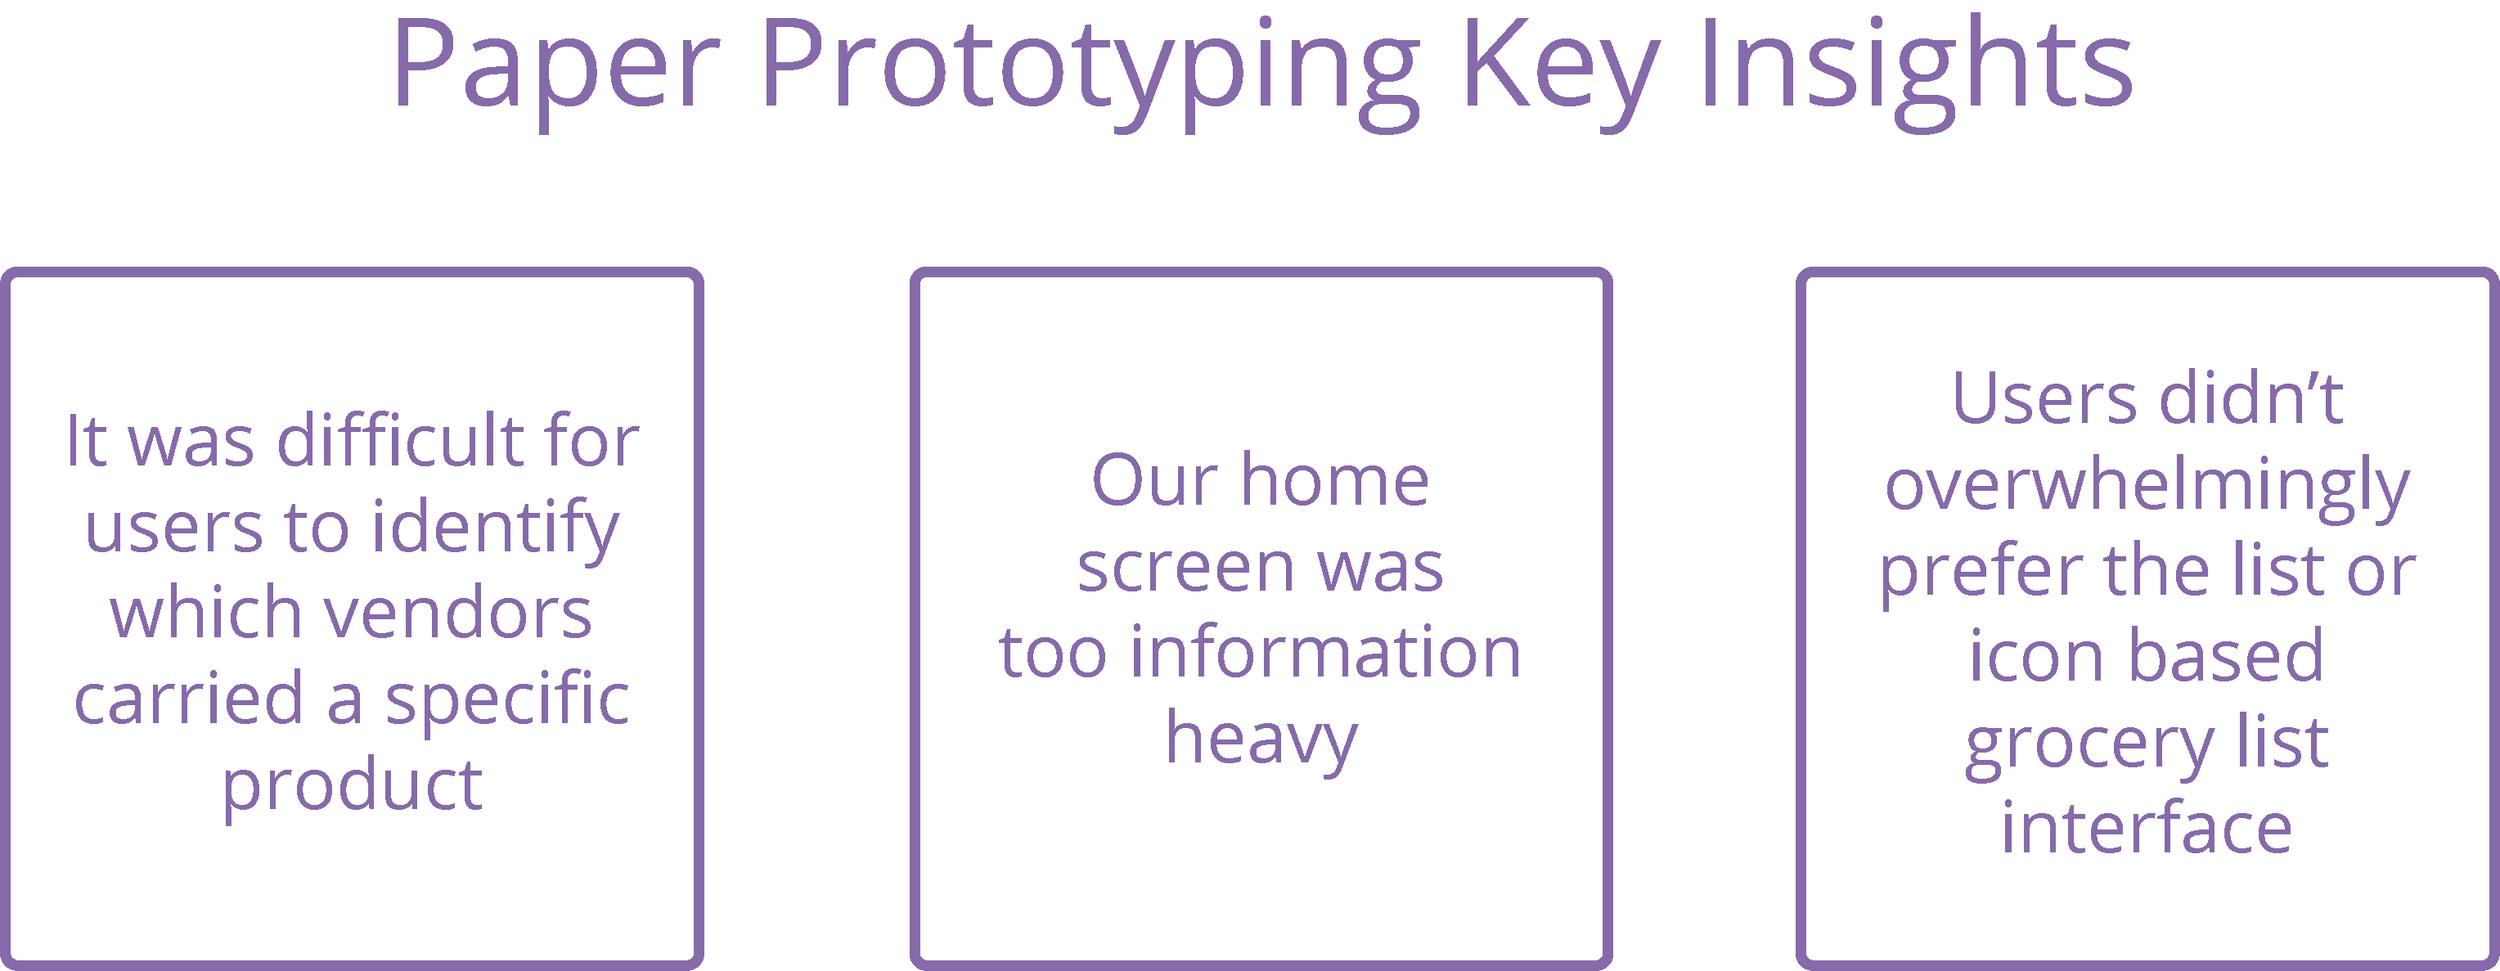 Key Insights.png